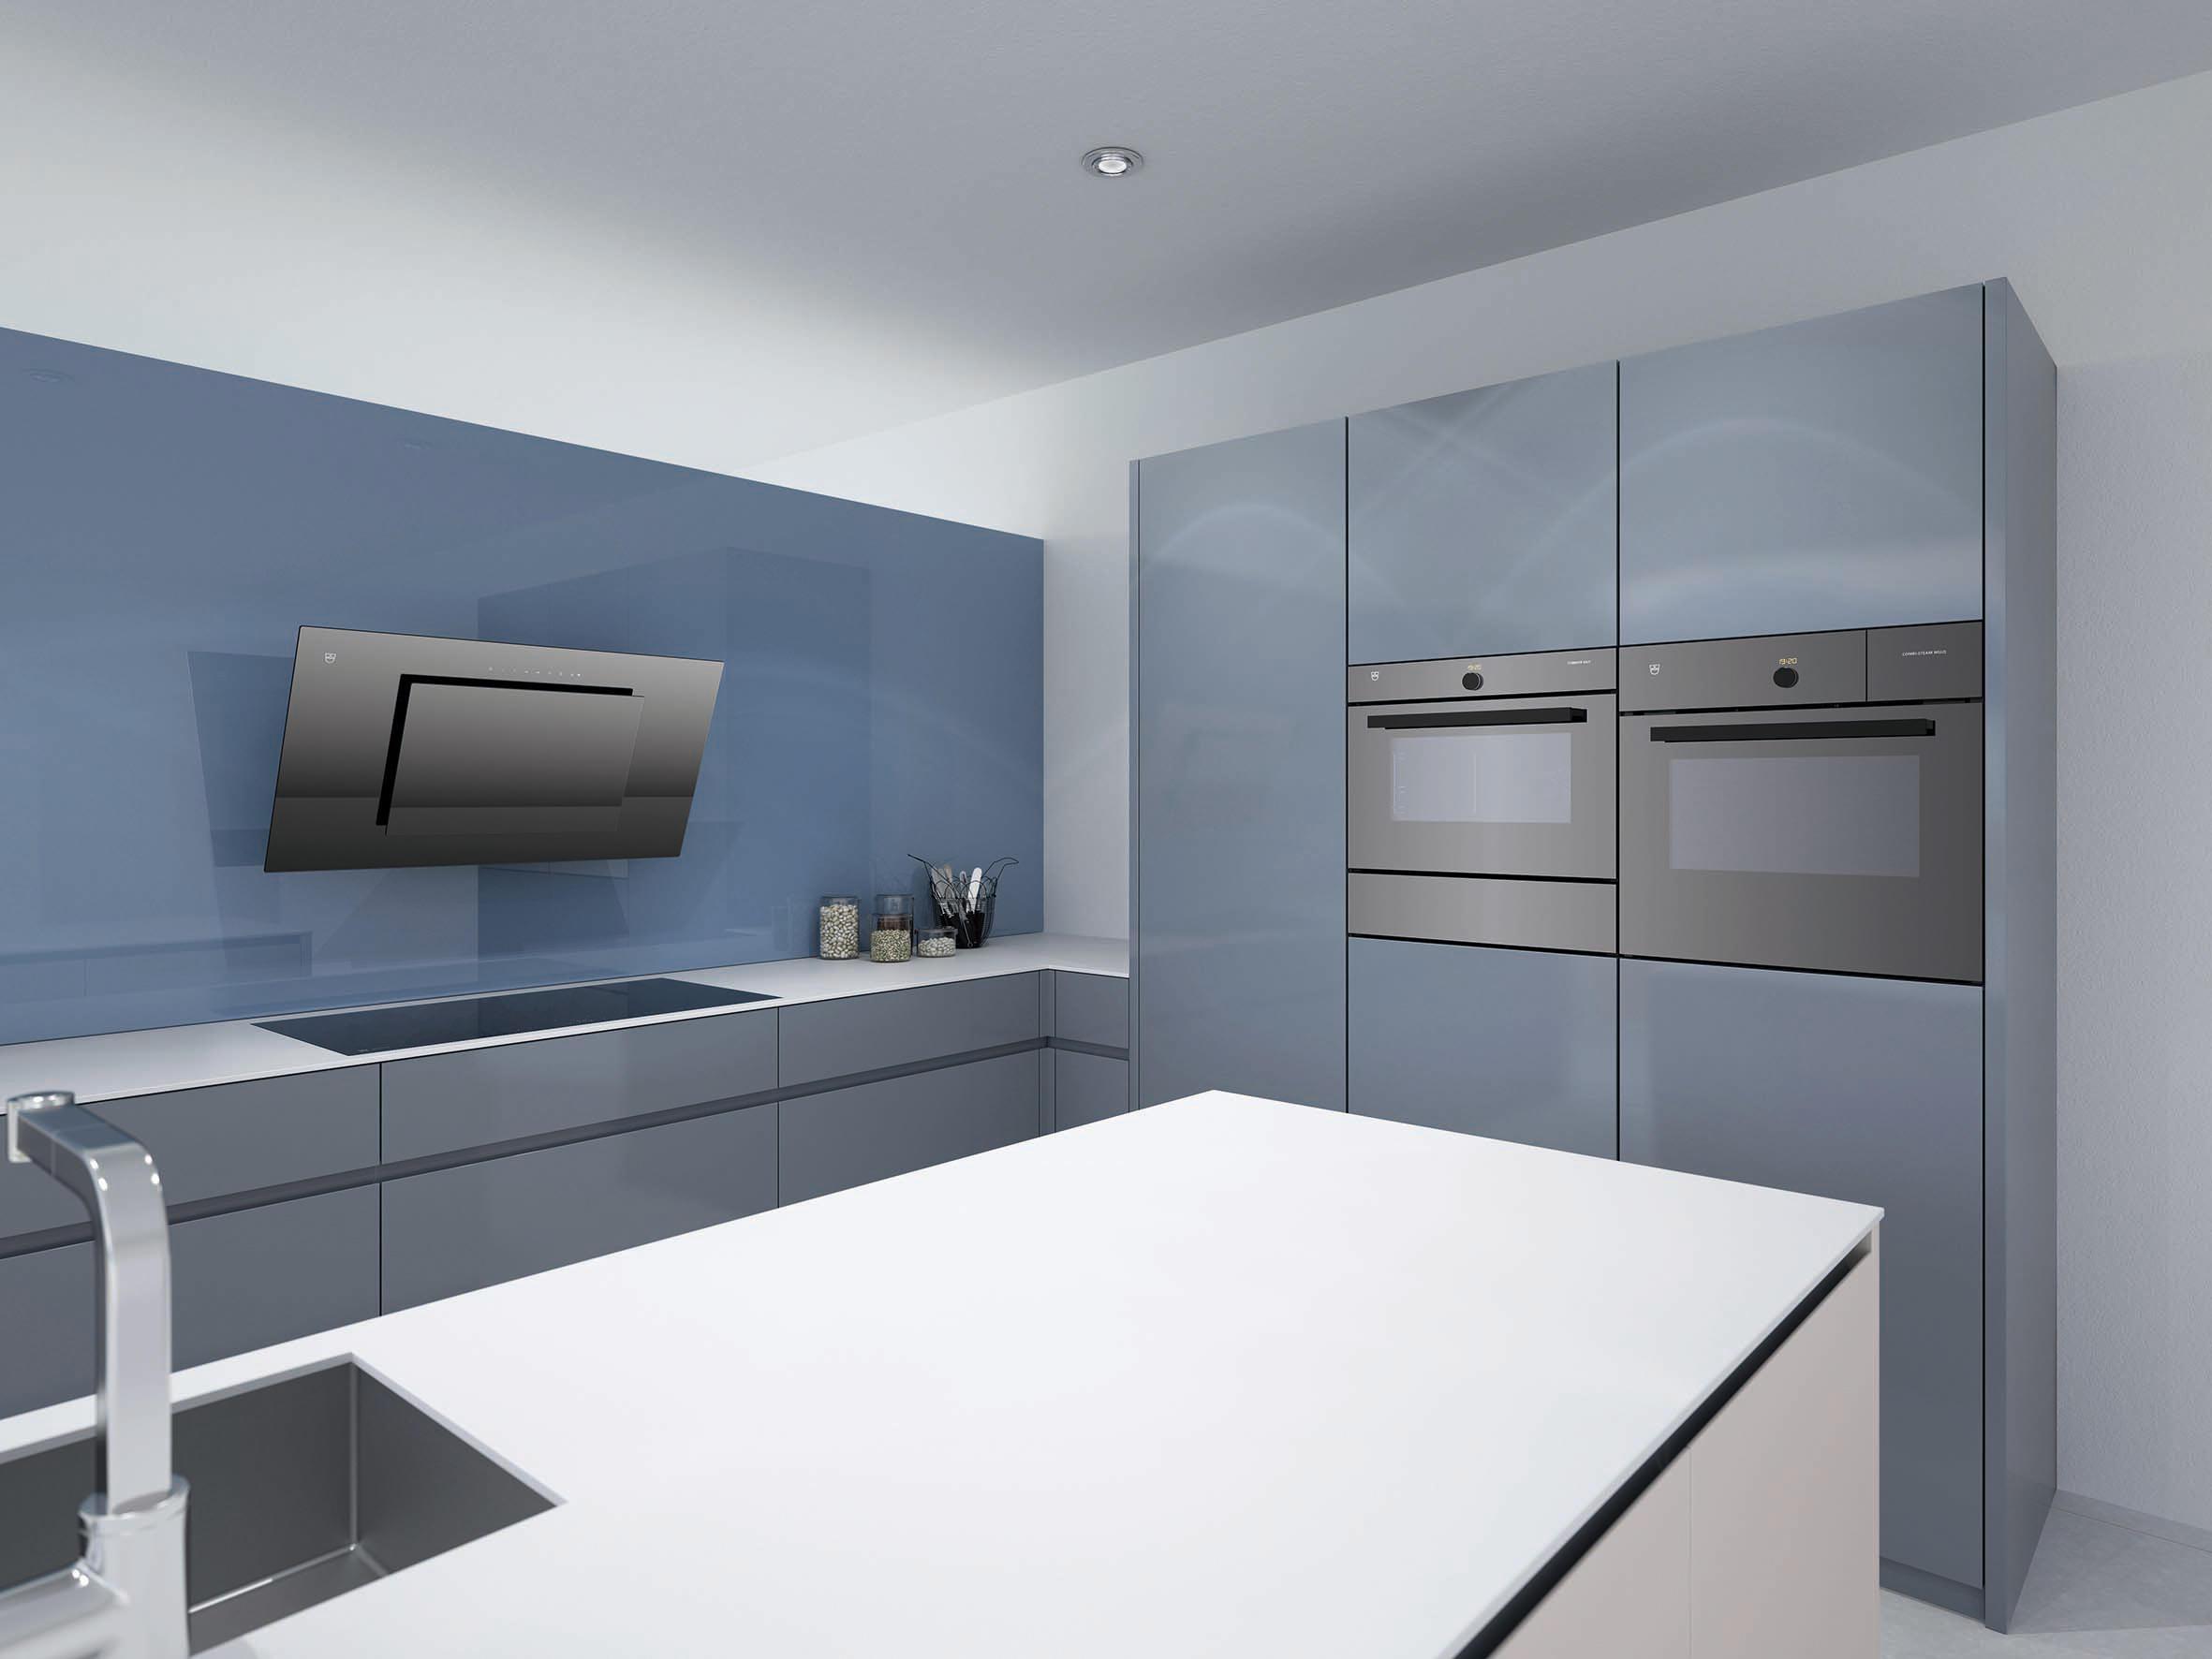 designer wall hood dwvhr9g extractors from v zug architonic. Black Bedroom Furniture Sets. Home Design Ideas